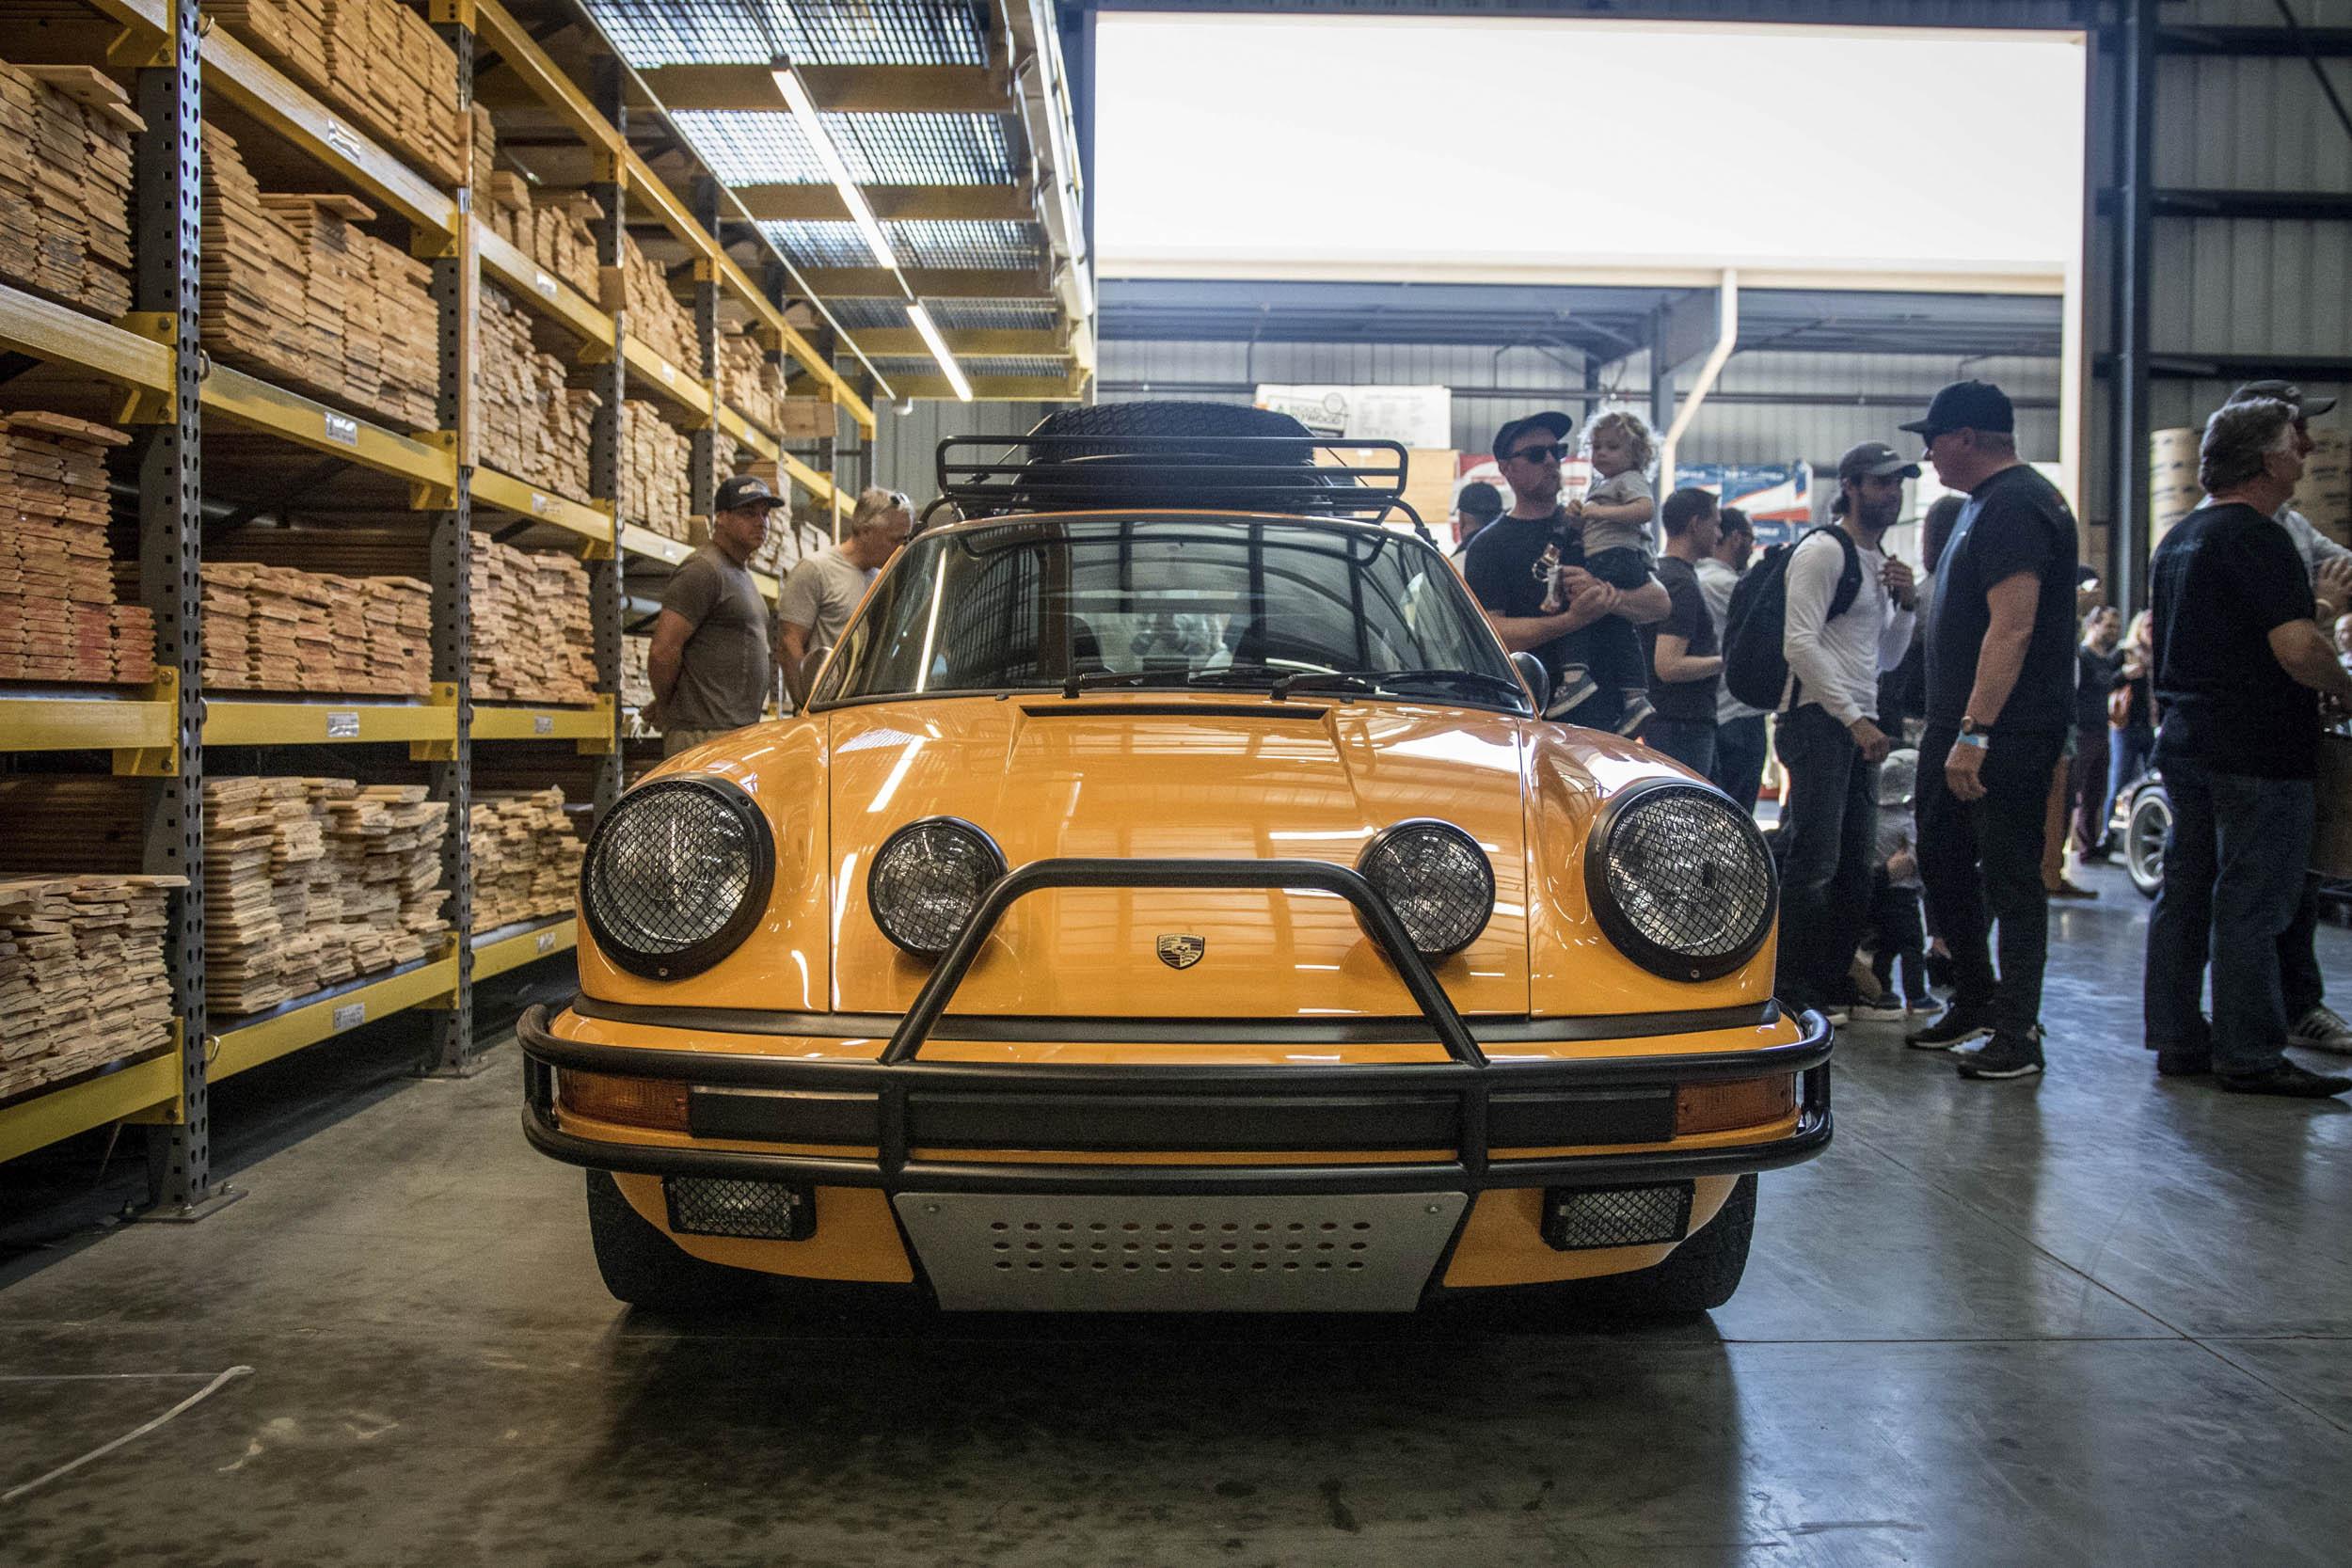 Porsche Safari 911 at Luftgekühlt front